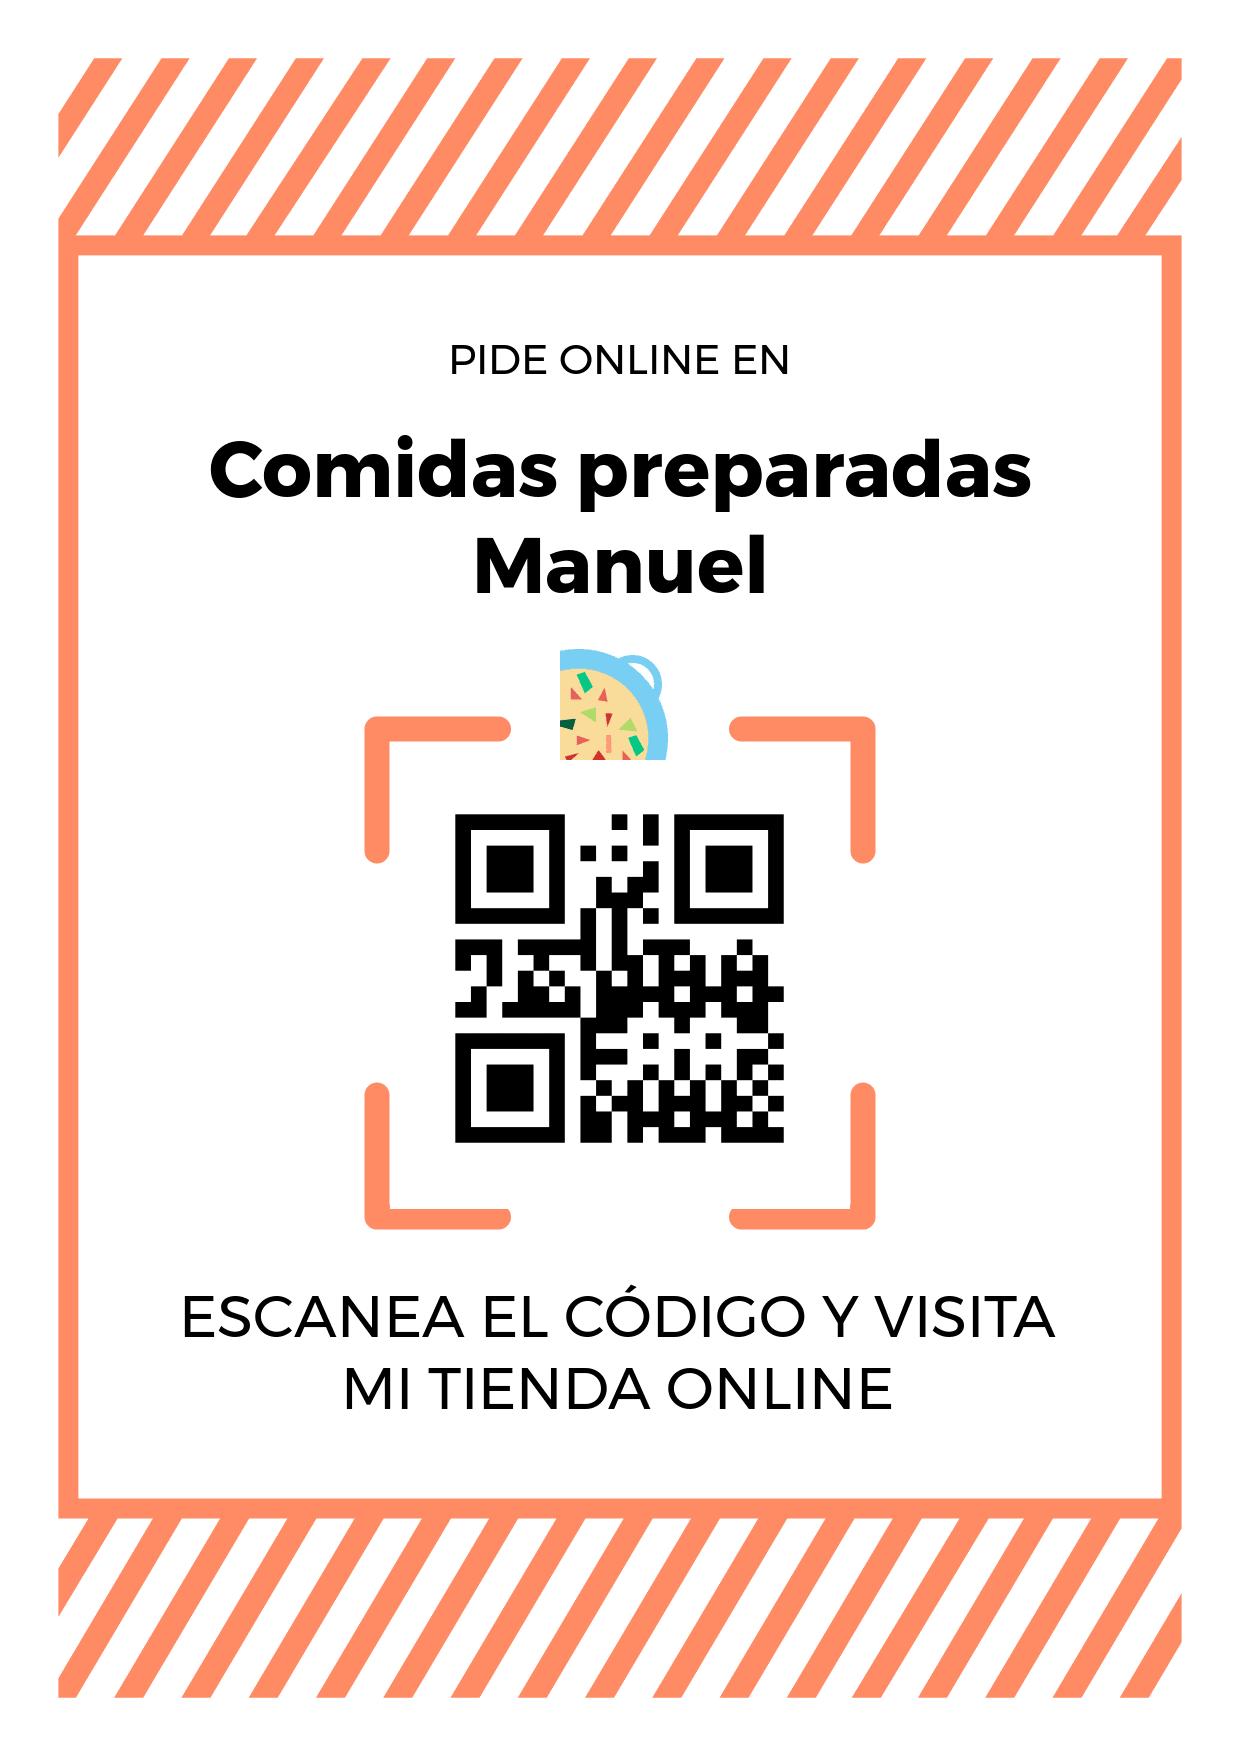 Cartel Póster de Código QR para tienda de Comidas preparadas